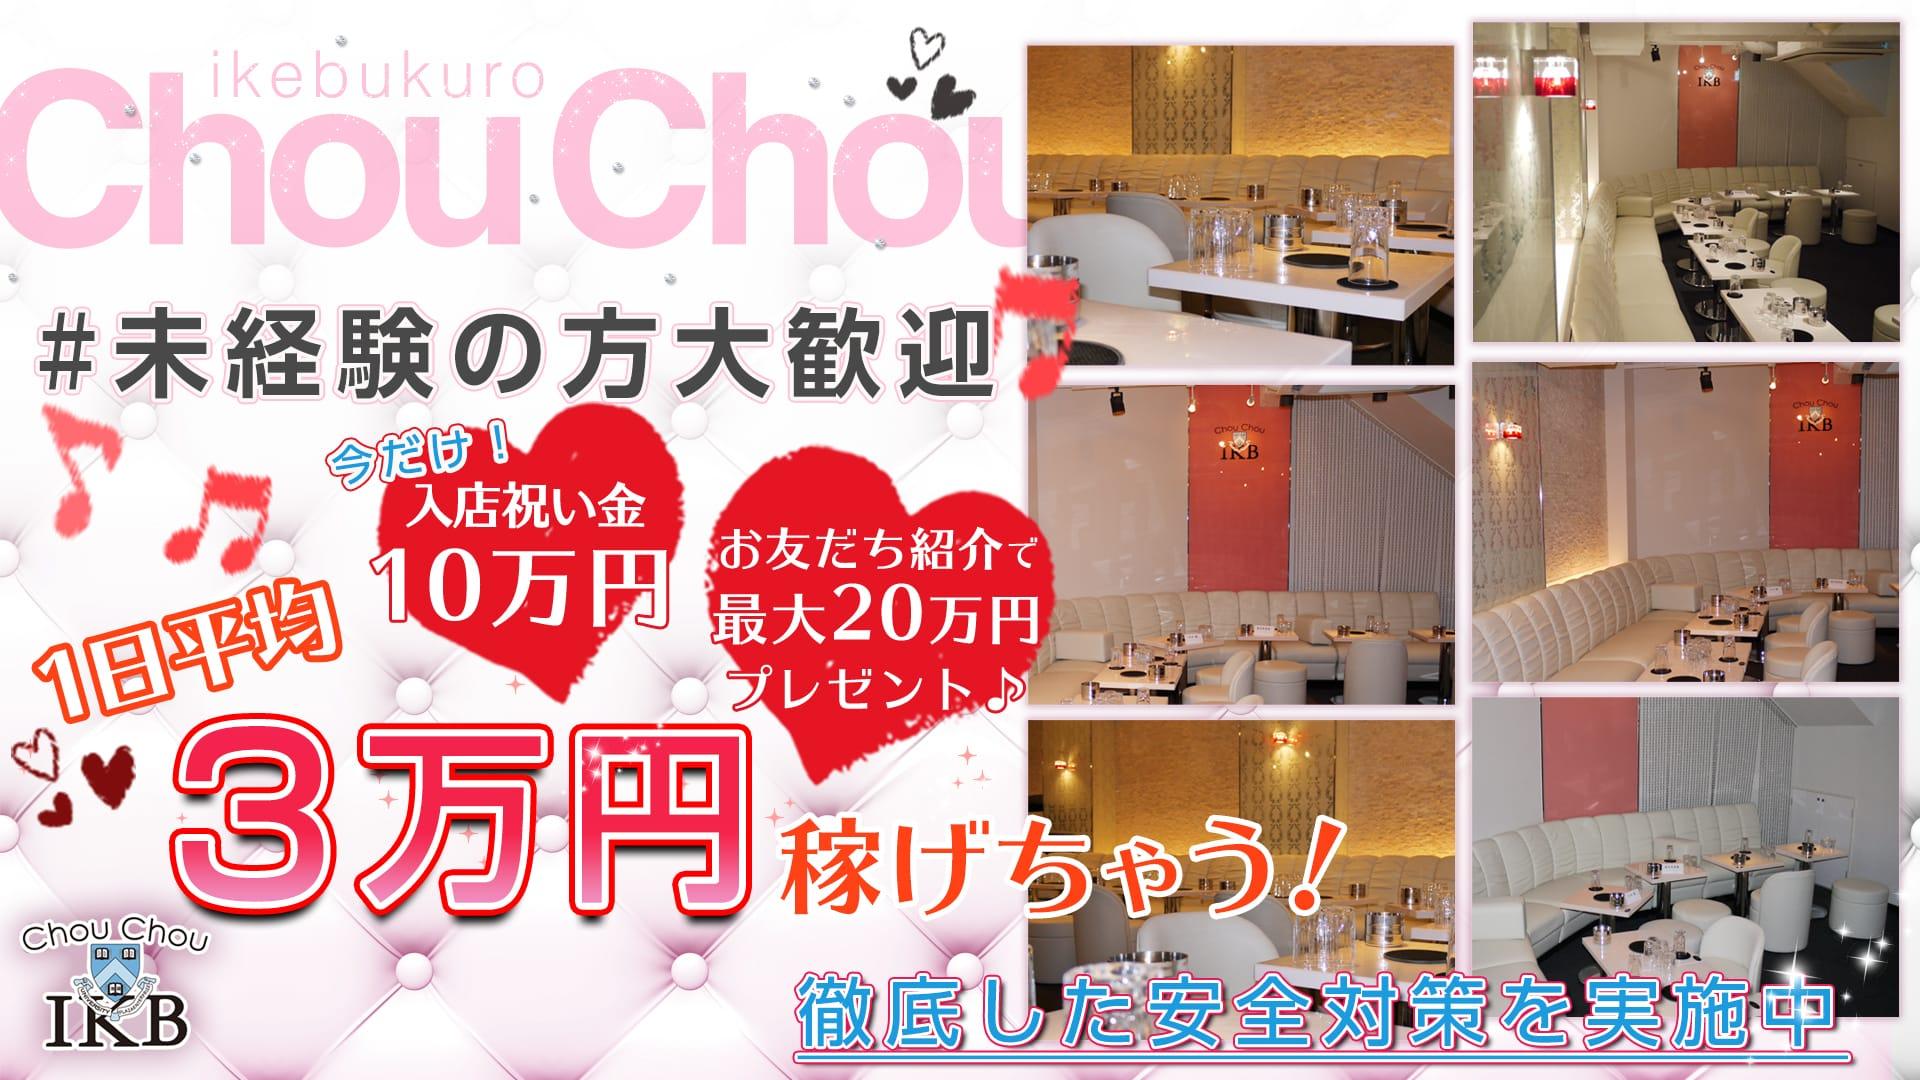 ChouChou(シュシュ)池袋西口店 池袋キャバクラ TOP画像